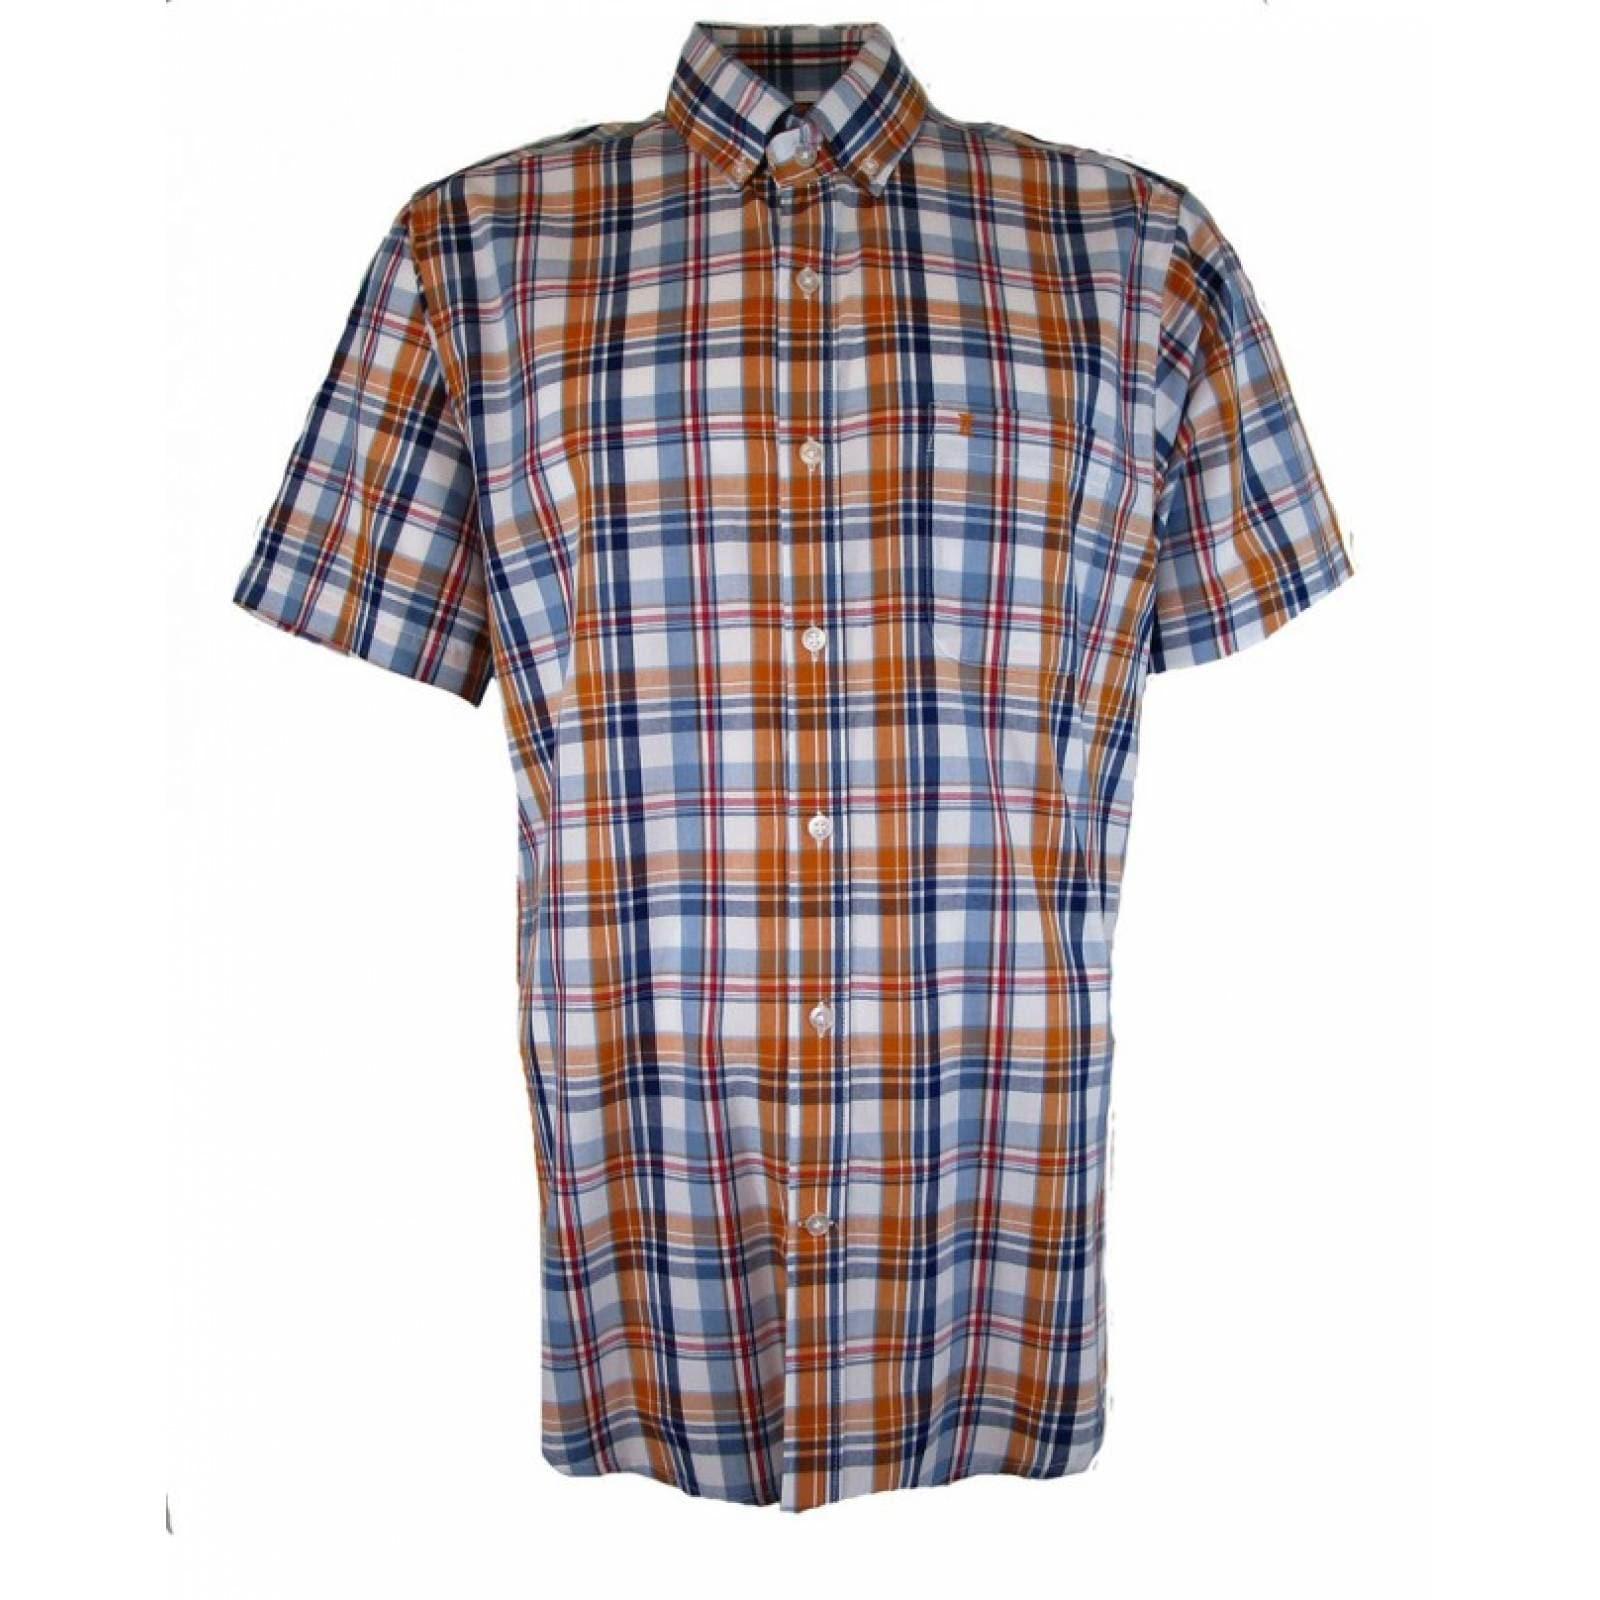 Camisa Dioro;Manga Corta;Cuadros;Naranjas ; Mediana